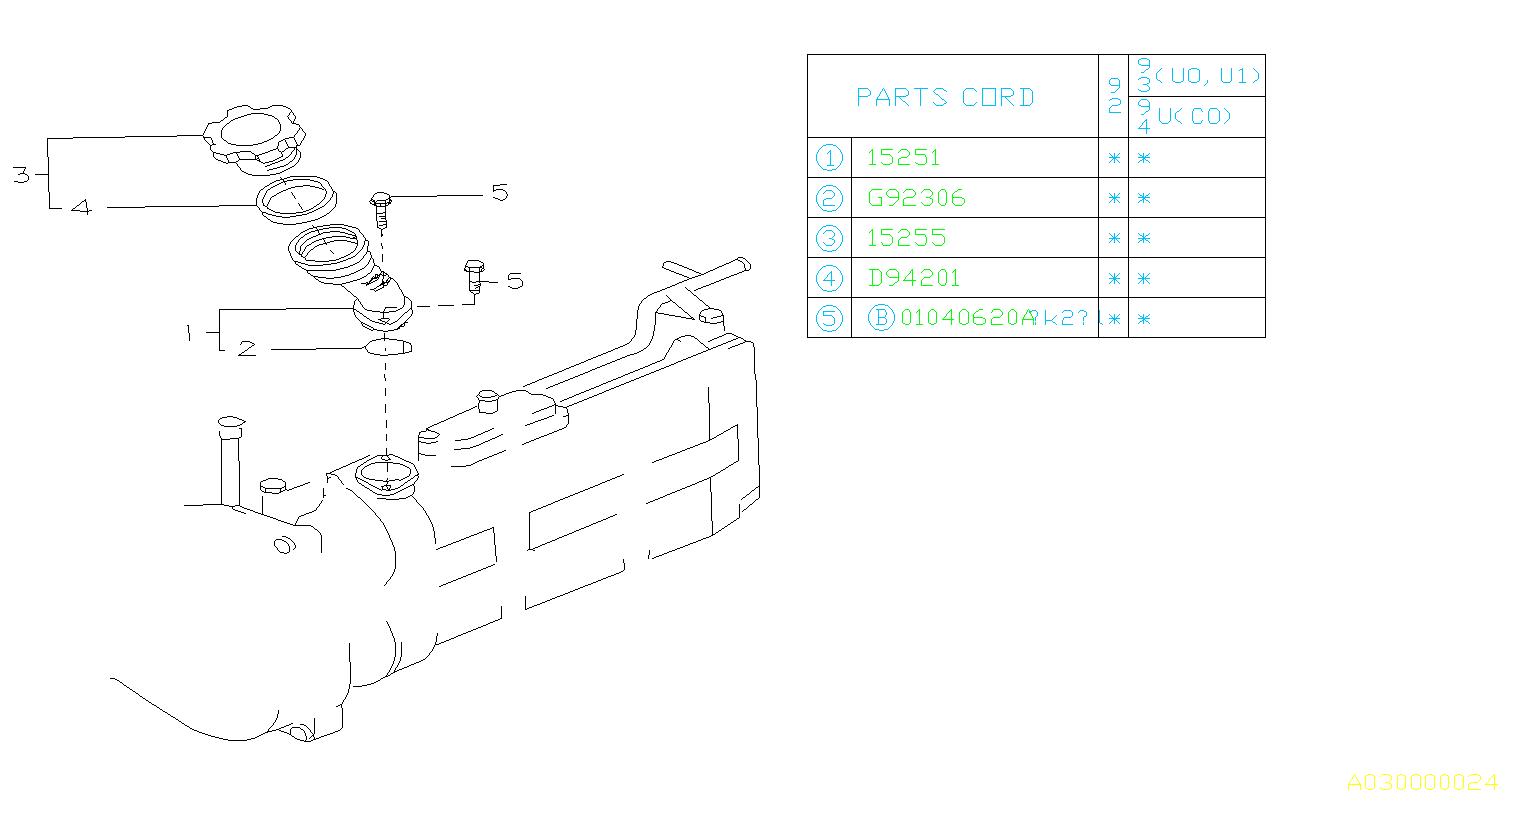 Db 9132 Diagram In Addition Subaru Forester Evap System